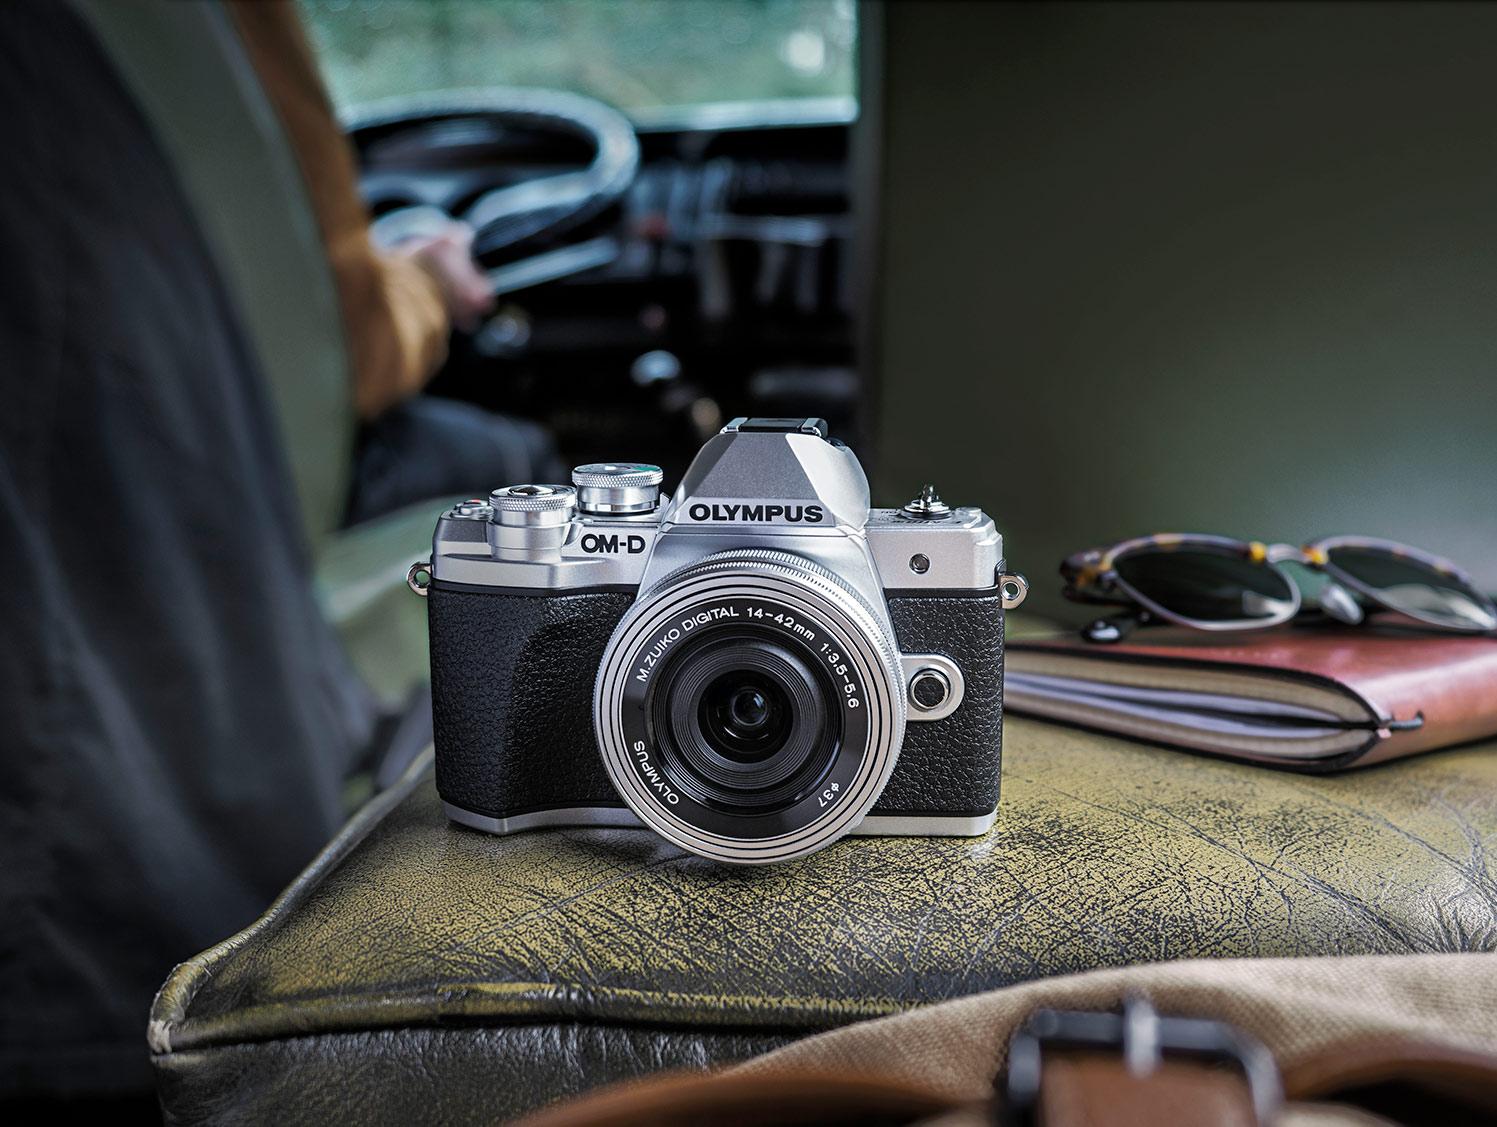 A lifestyle shot of an Olympus OMD camera Olympus sale